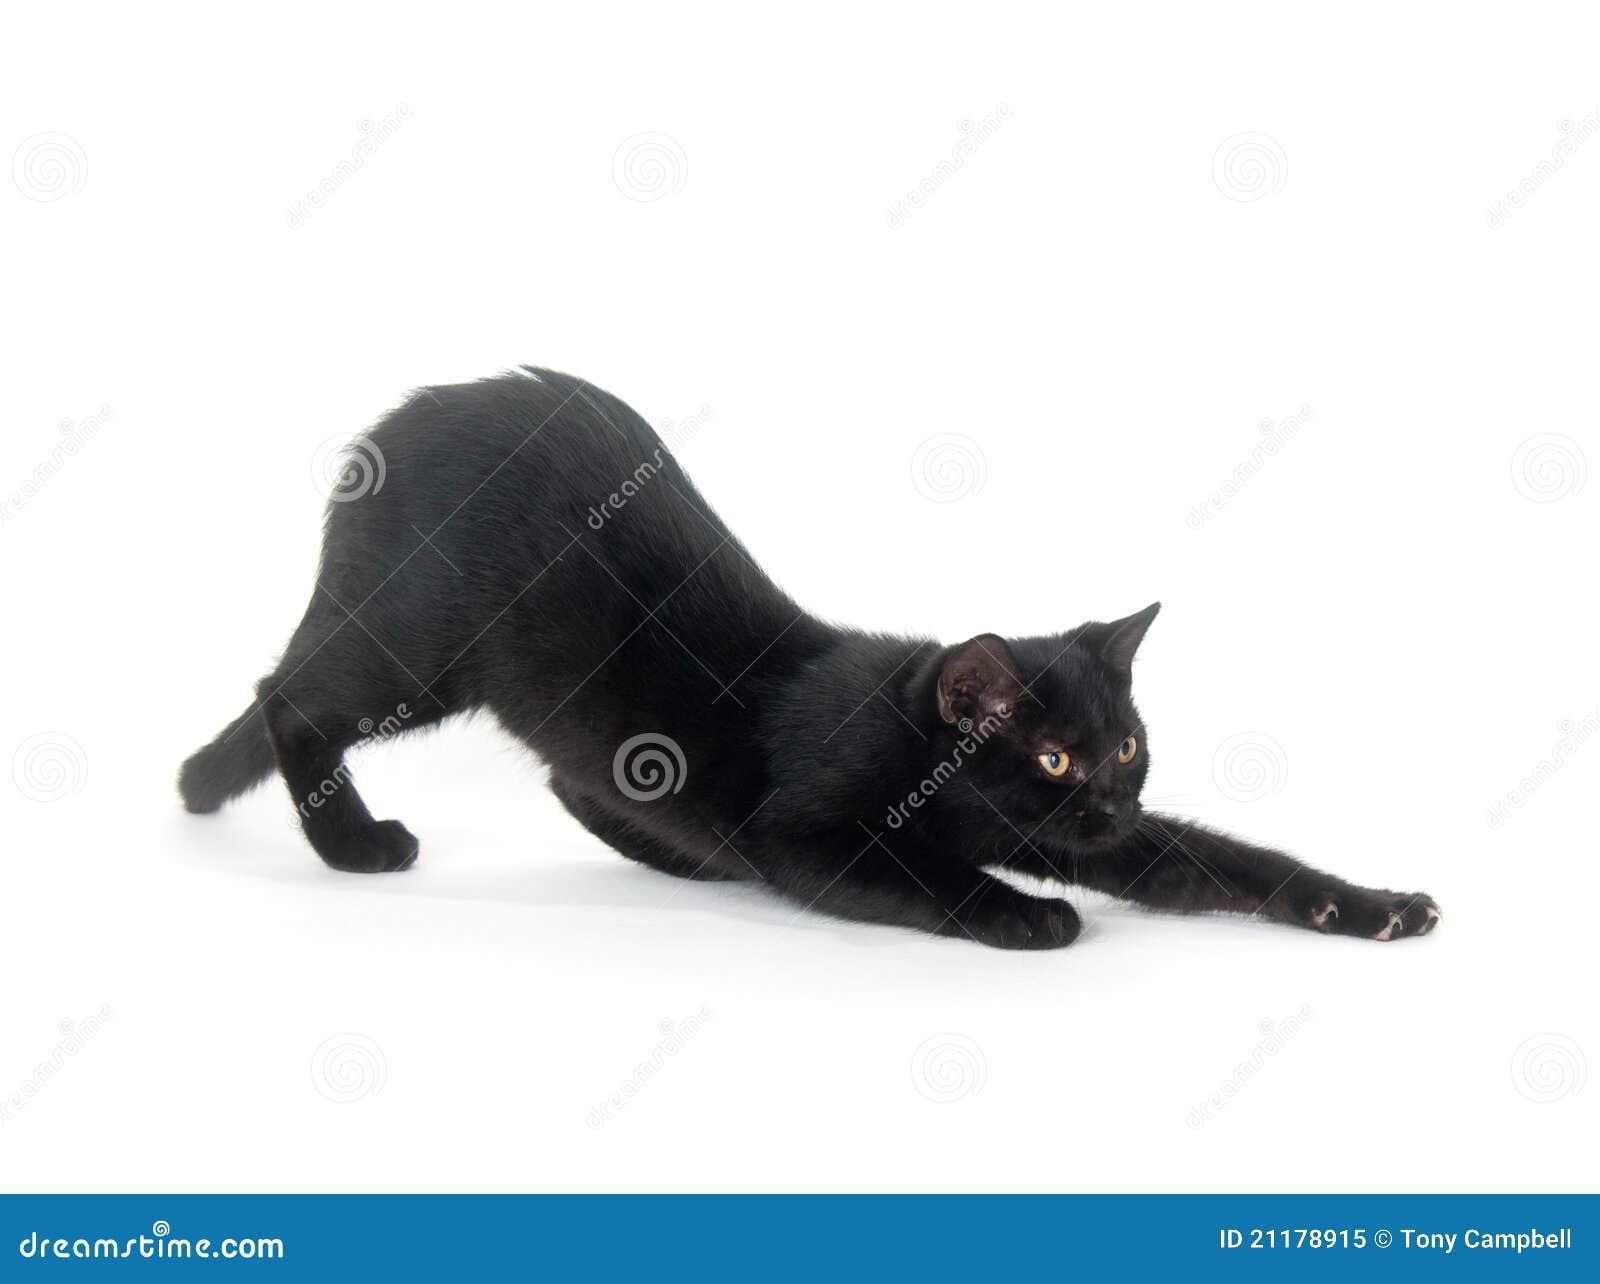 Black cat stretching on white